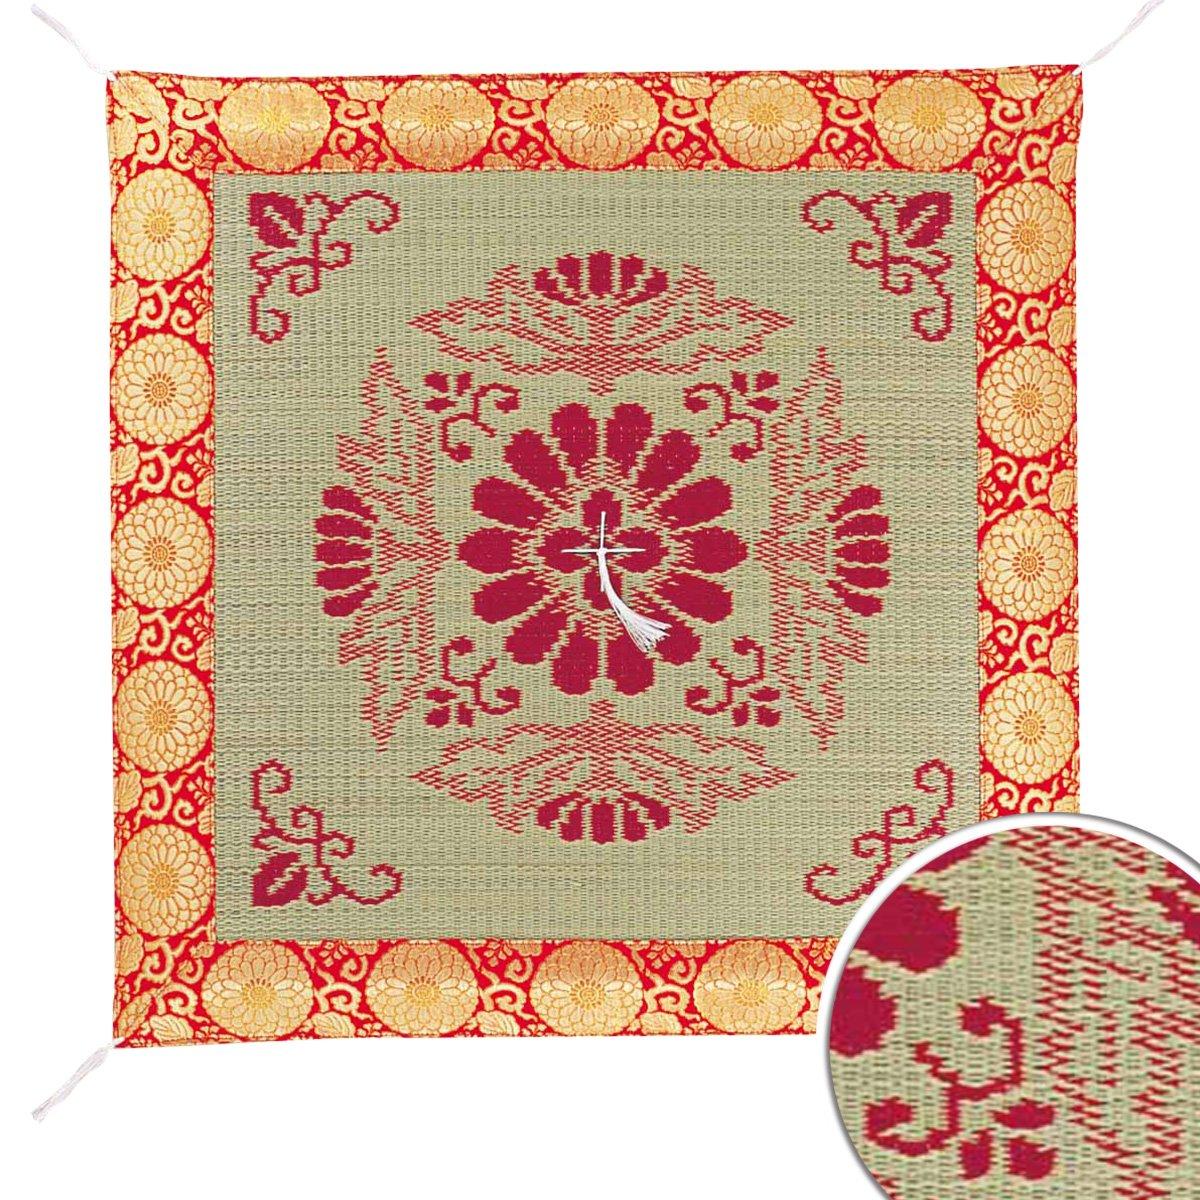 Four Seasons Handmade Japanese Brocade Fabric Zabuton Meditation Cushion(Grasshopper)26.7× 26.7Inch